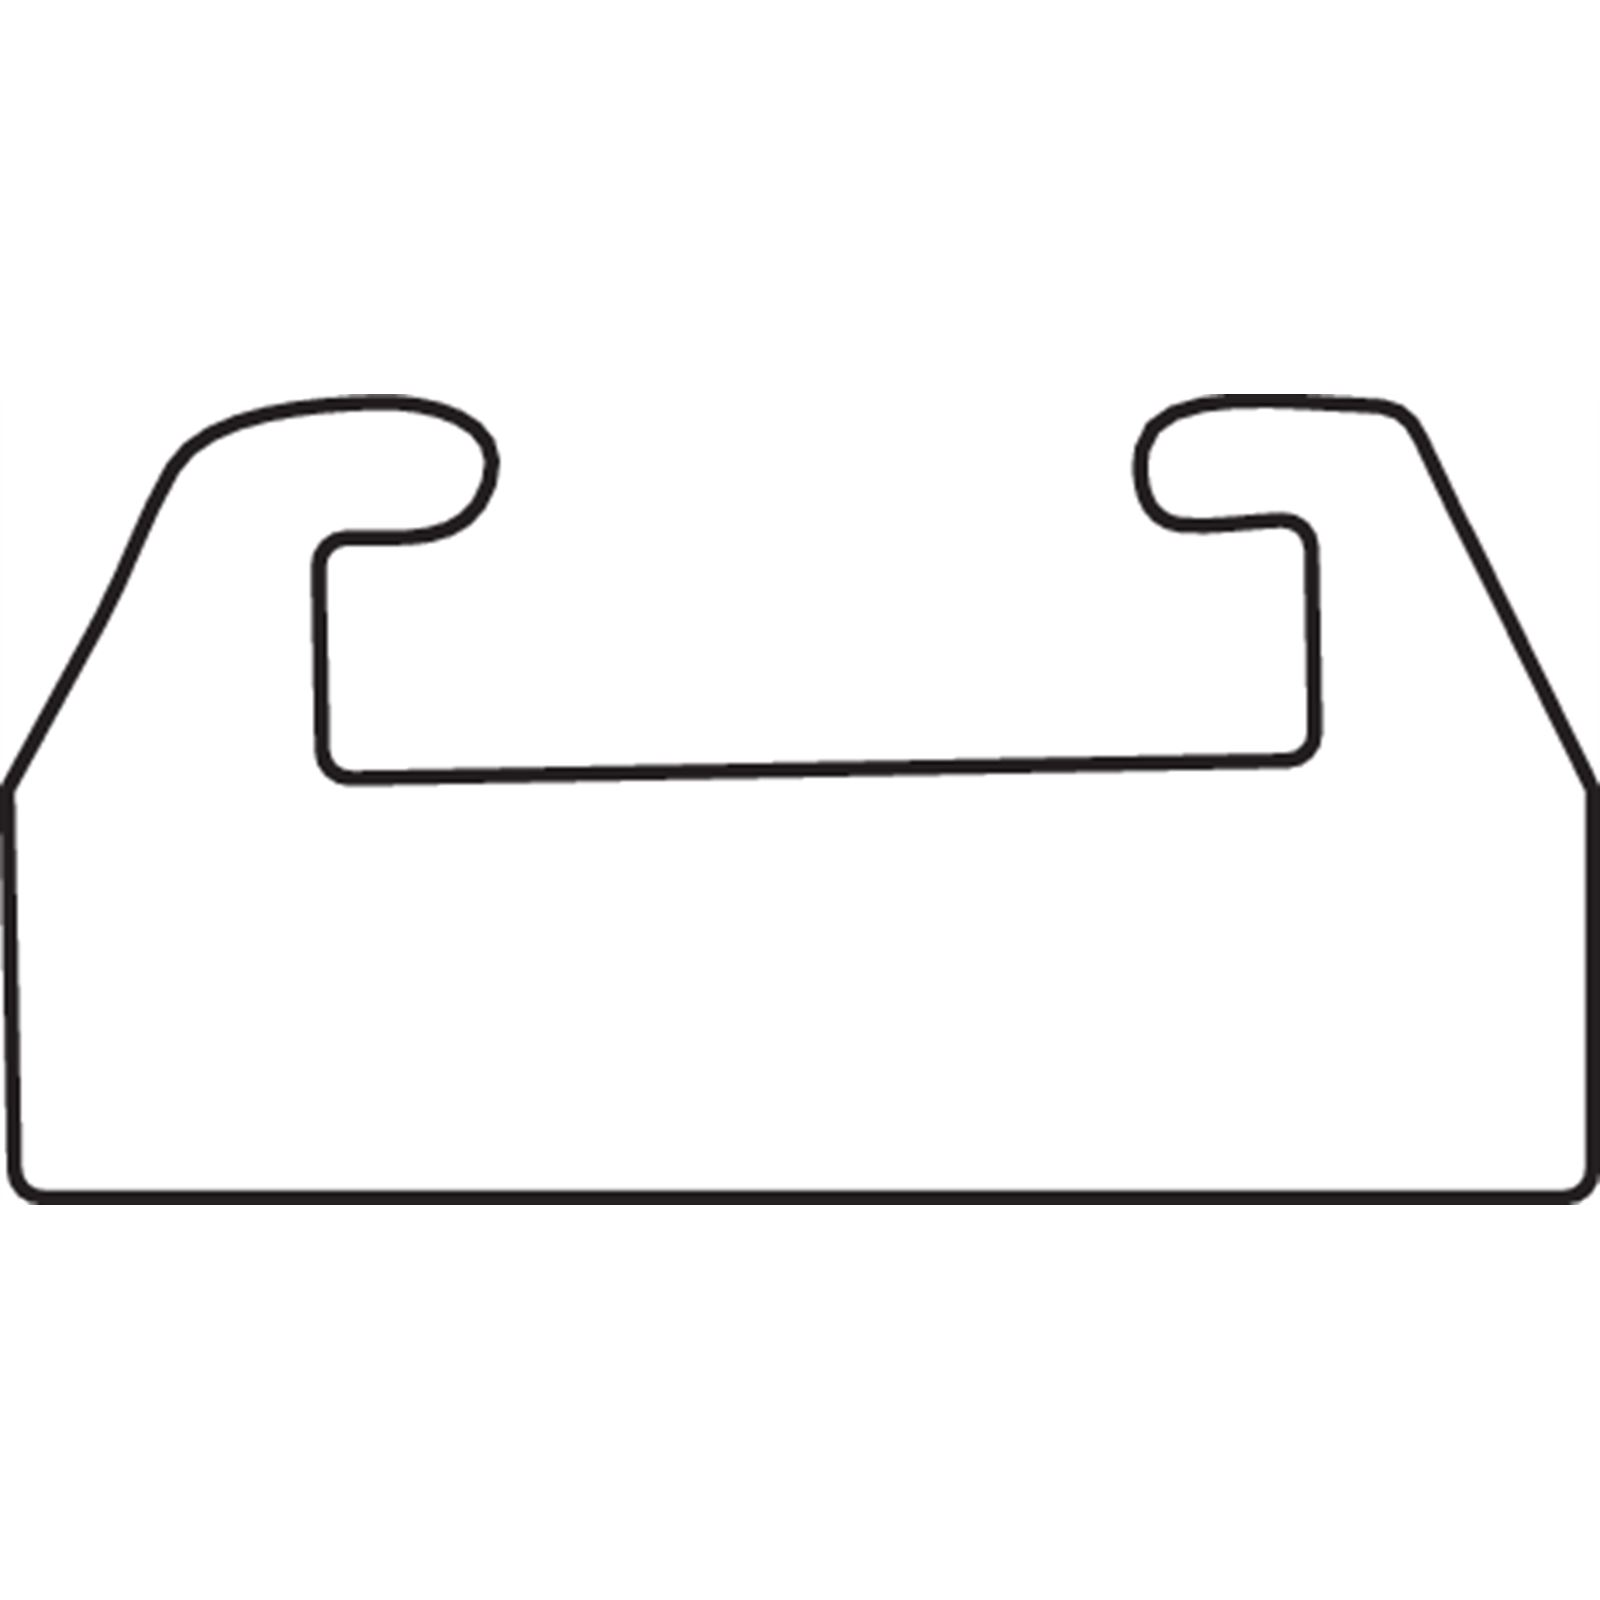 "Garland Black Replacement Slide - UHMW - Profile 26 - Length 41.63"" - Ski-Doo"